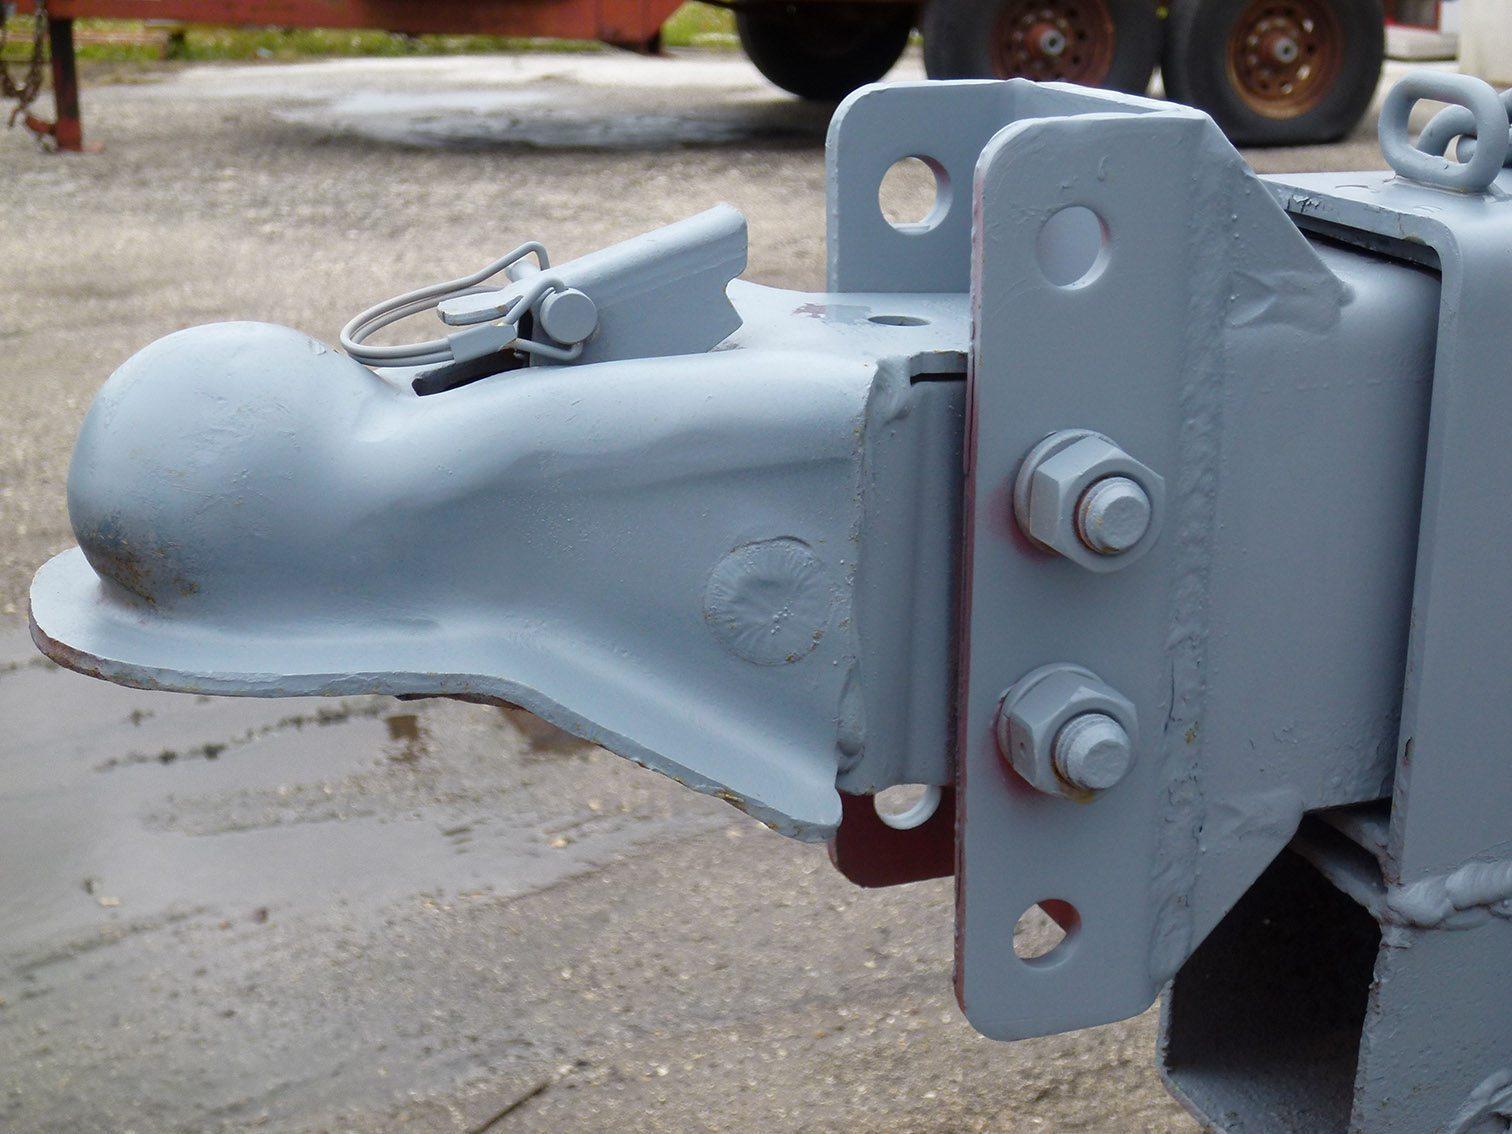 Truck Modify Hitch